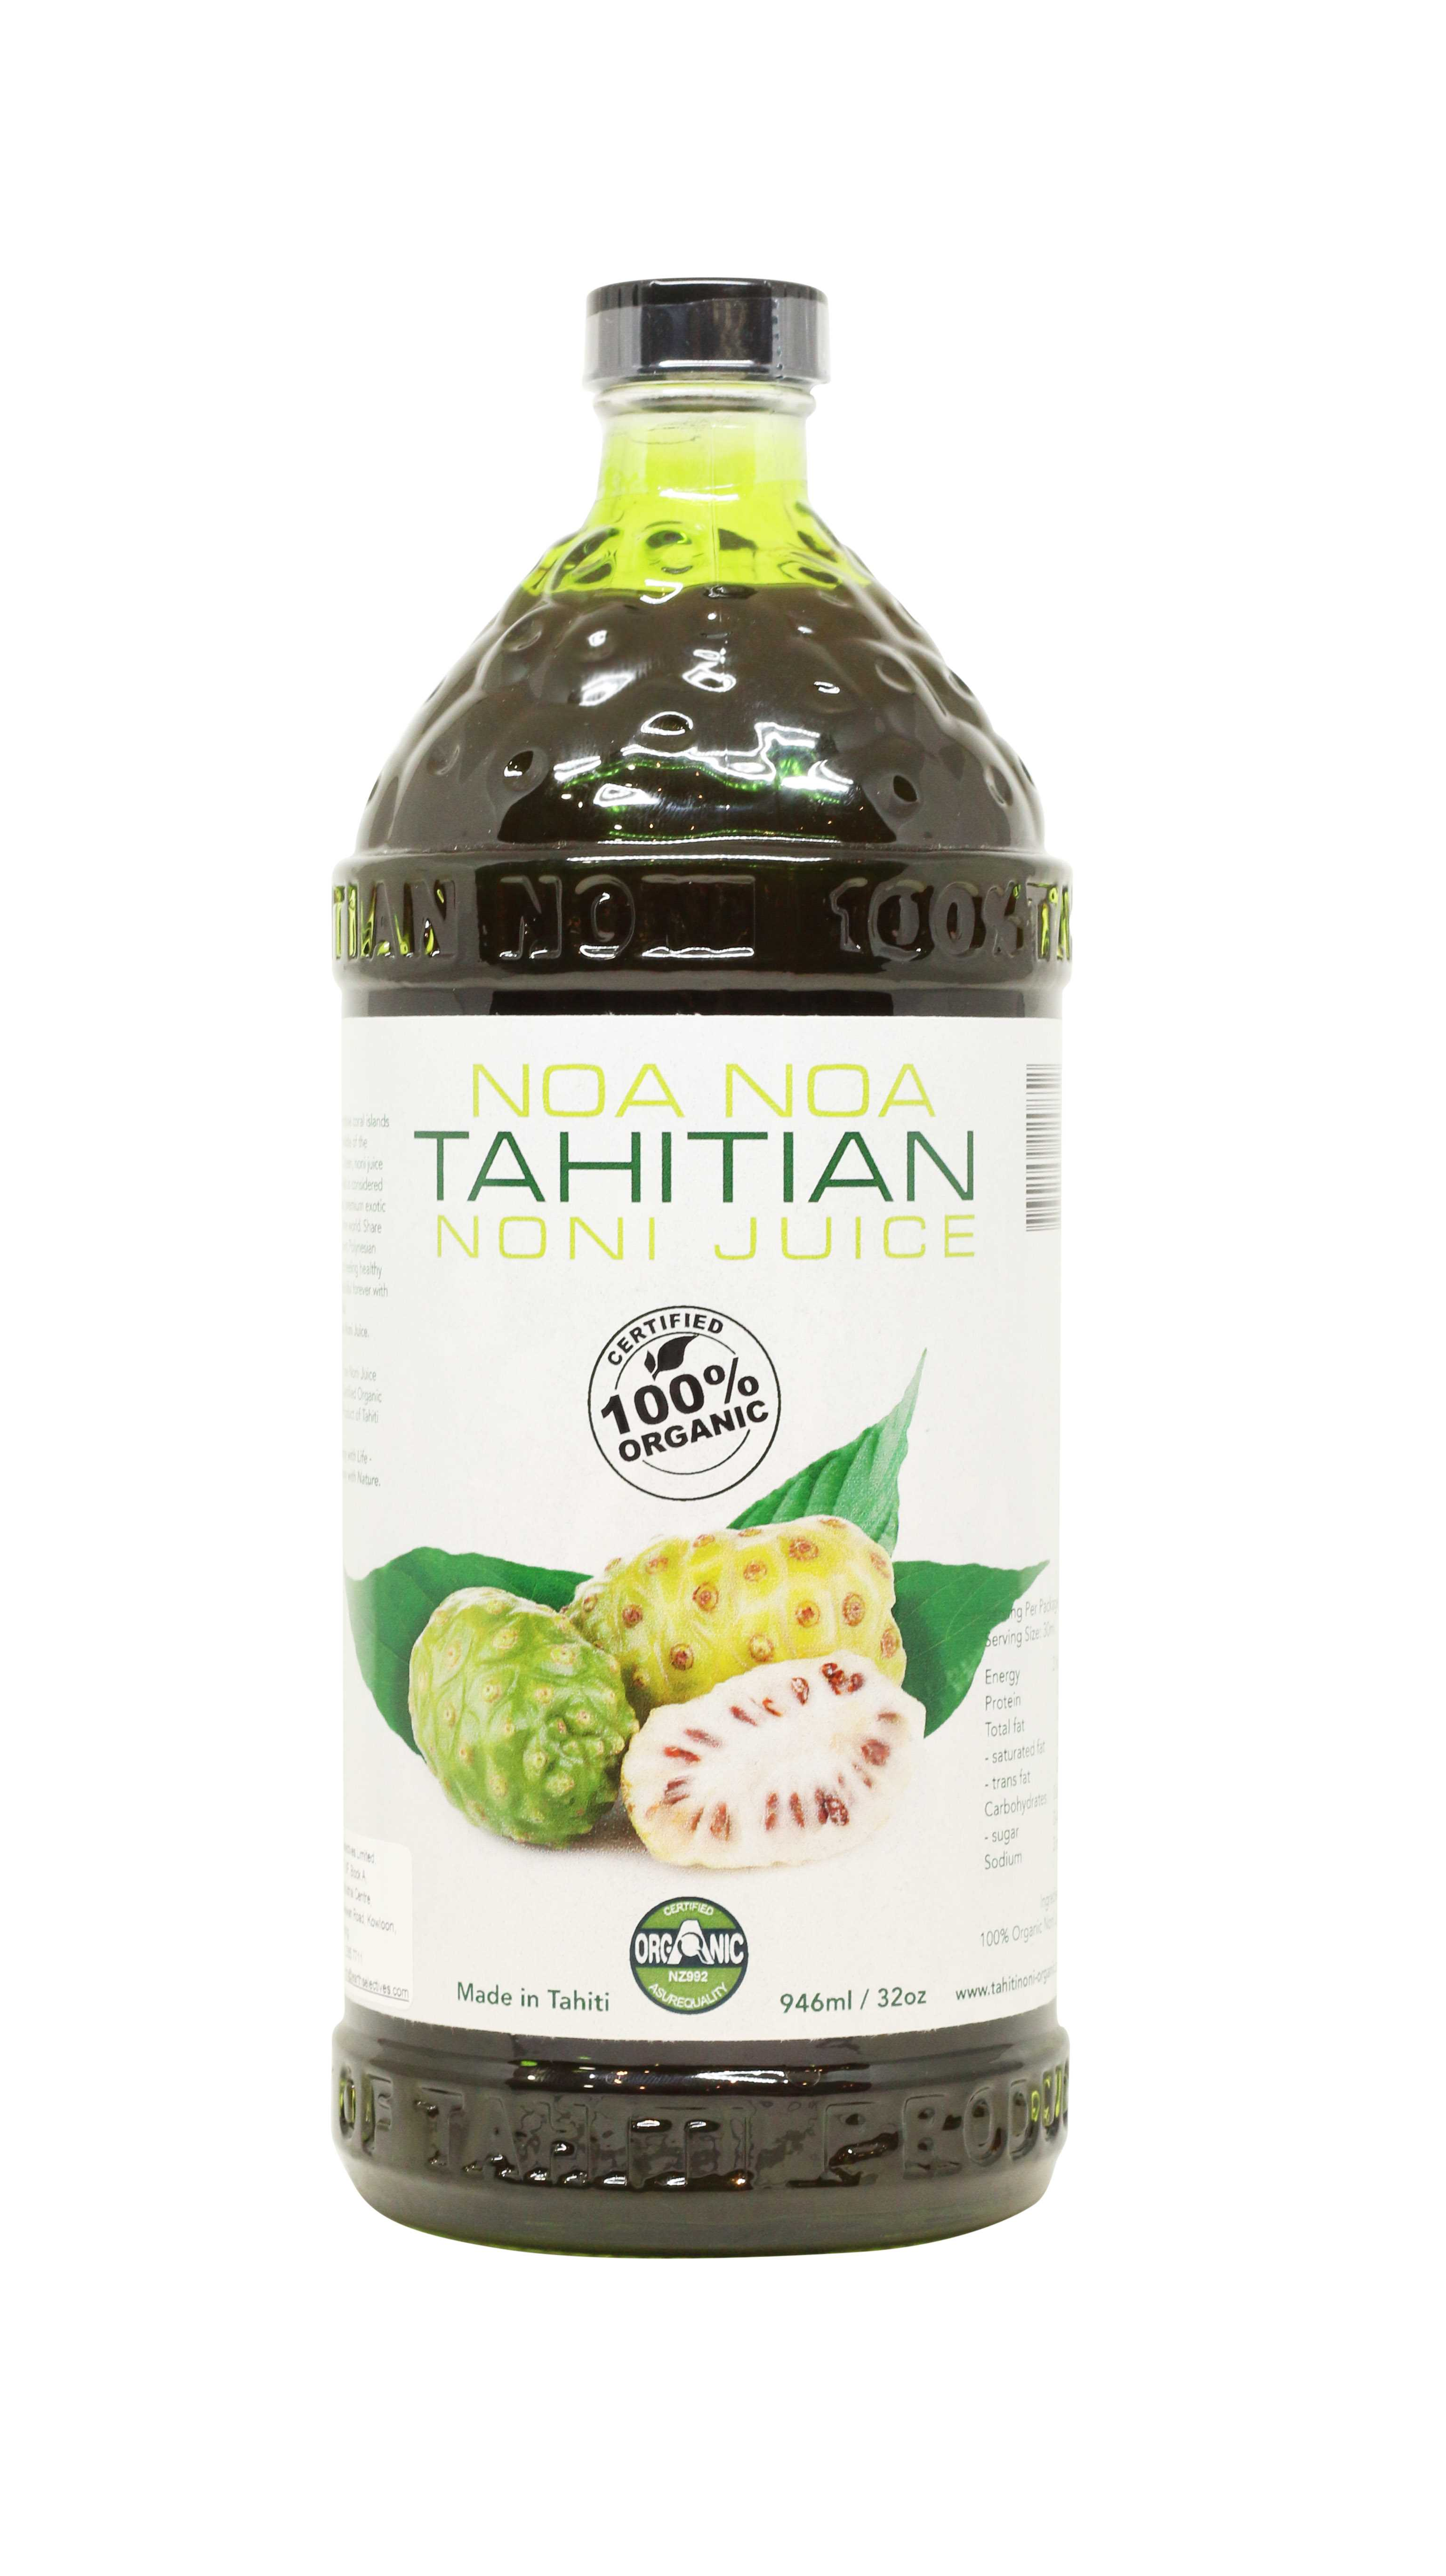 Noanoa Tahitian 有机大溪地诺丽汁